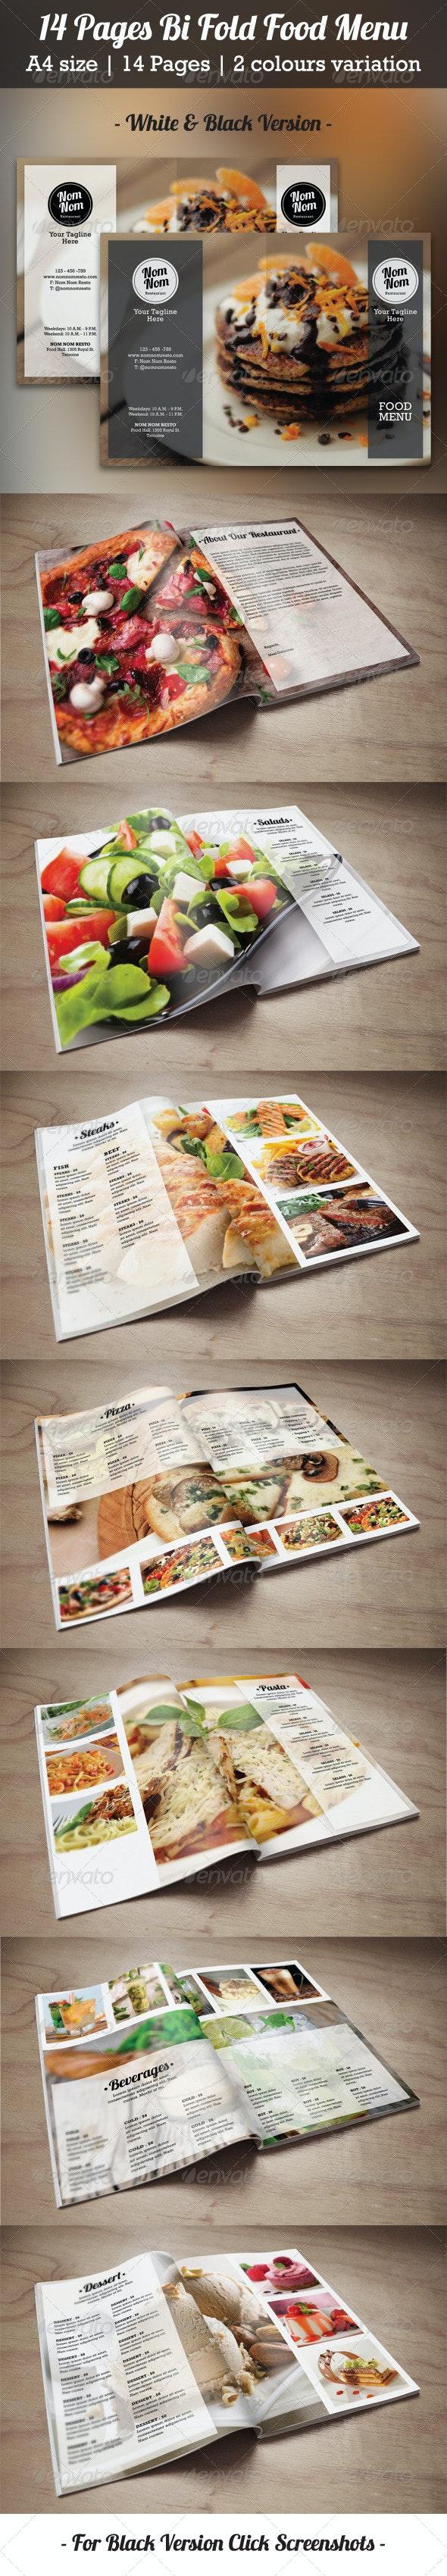 14 Pages Bi Fold Food Menu - Food Menus Print Templates